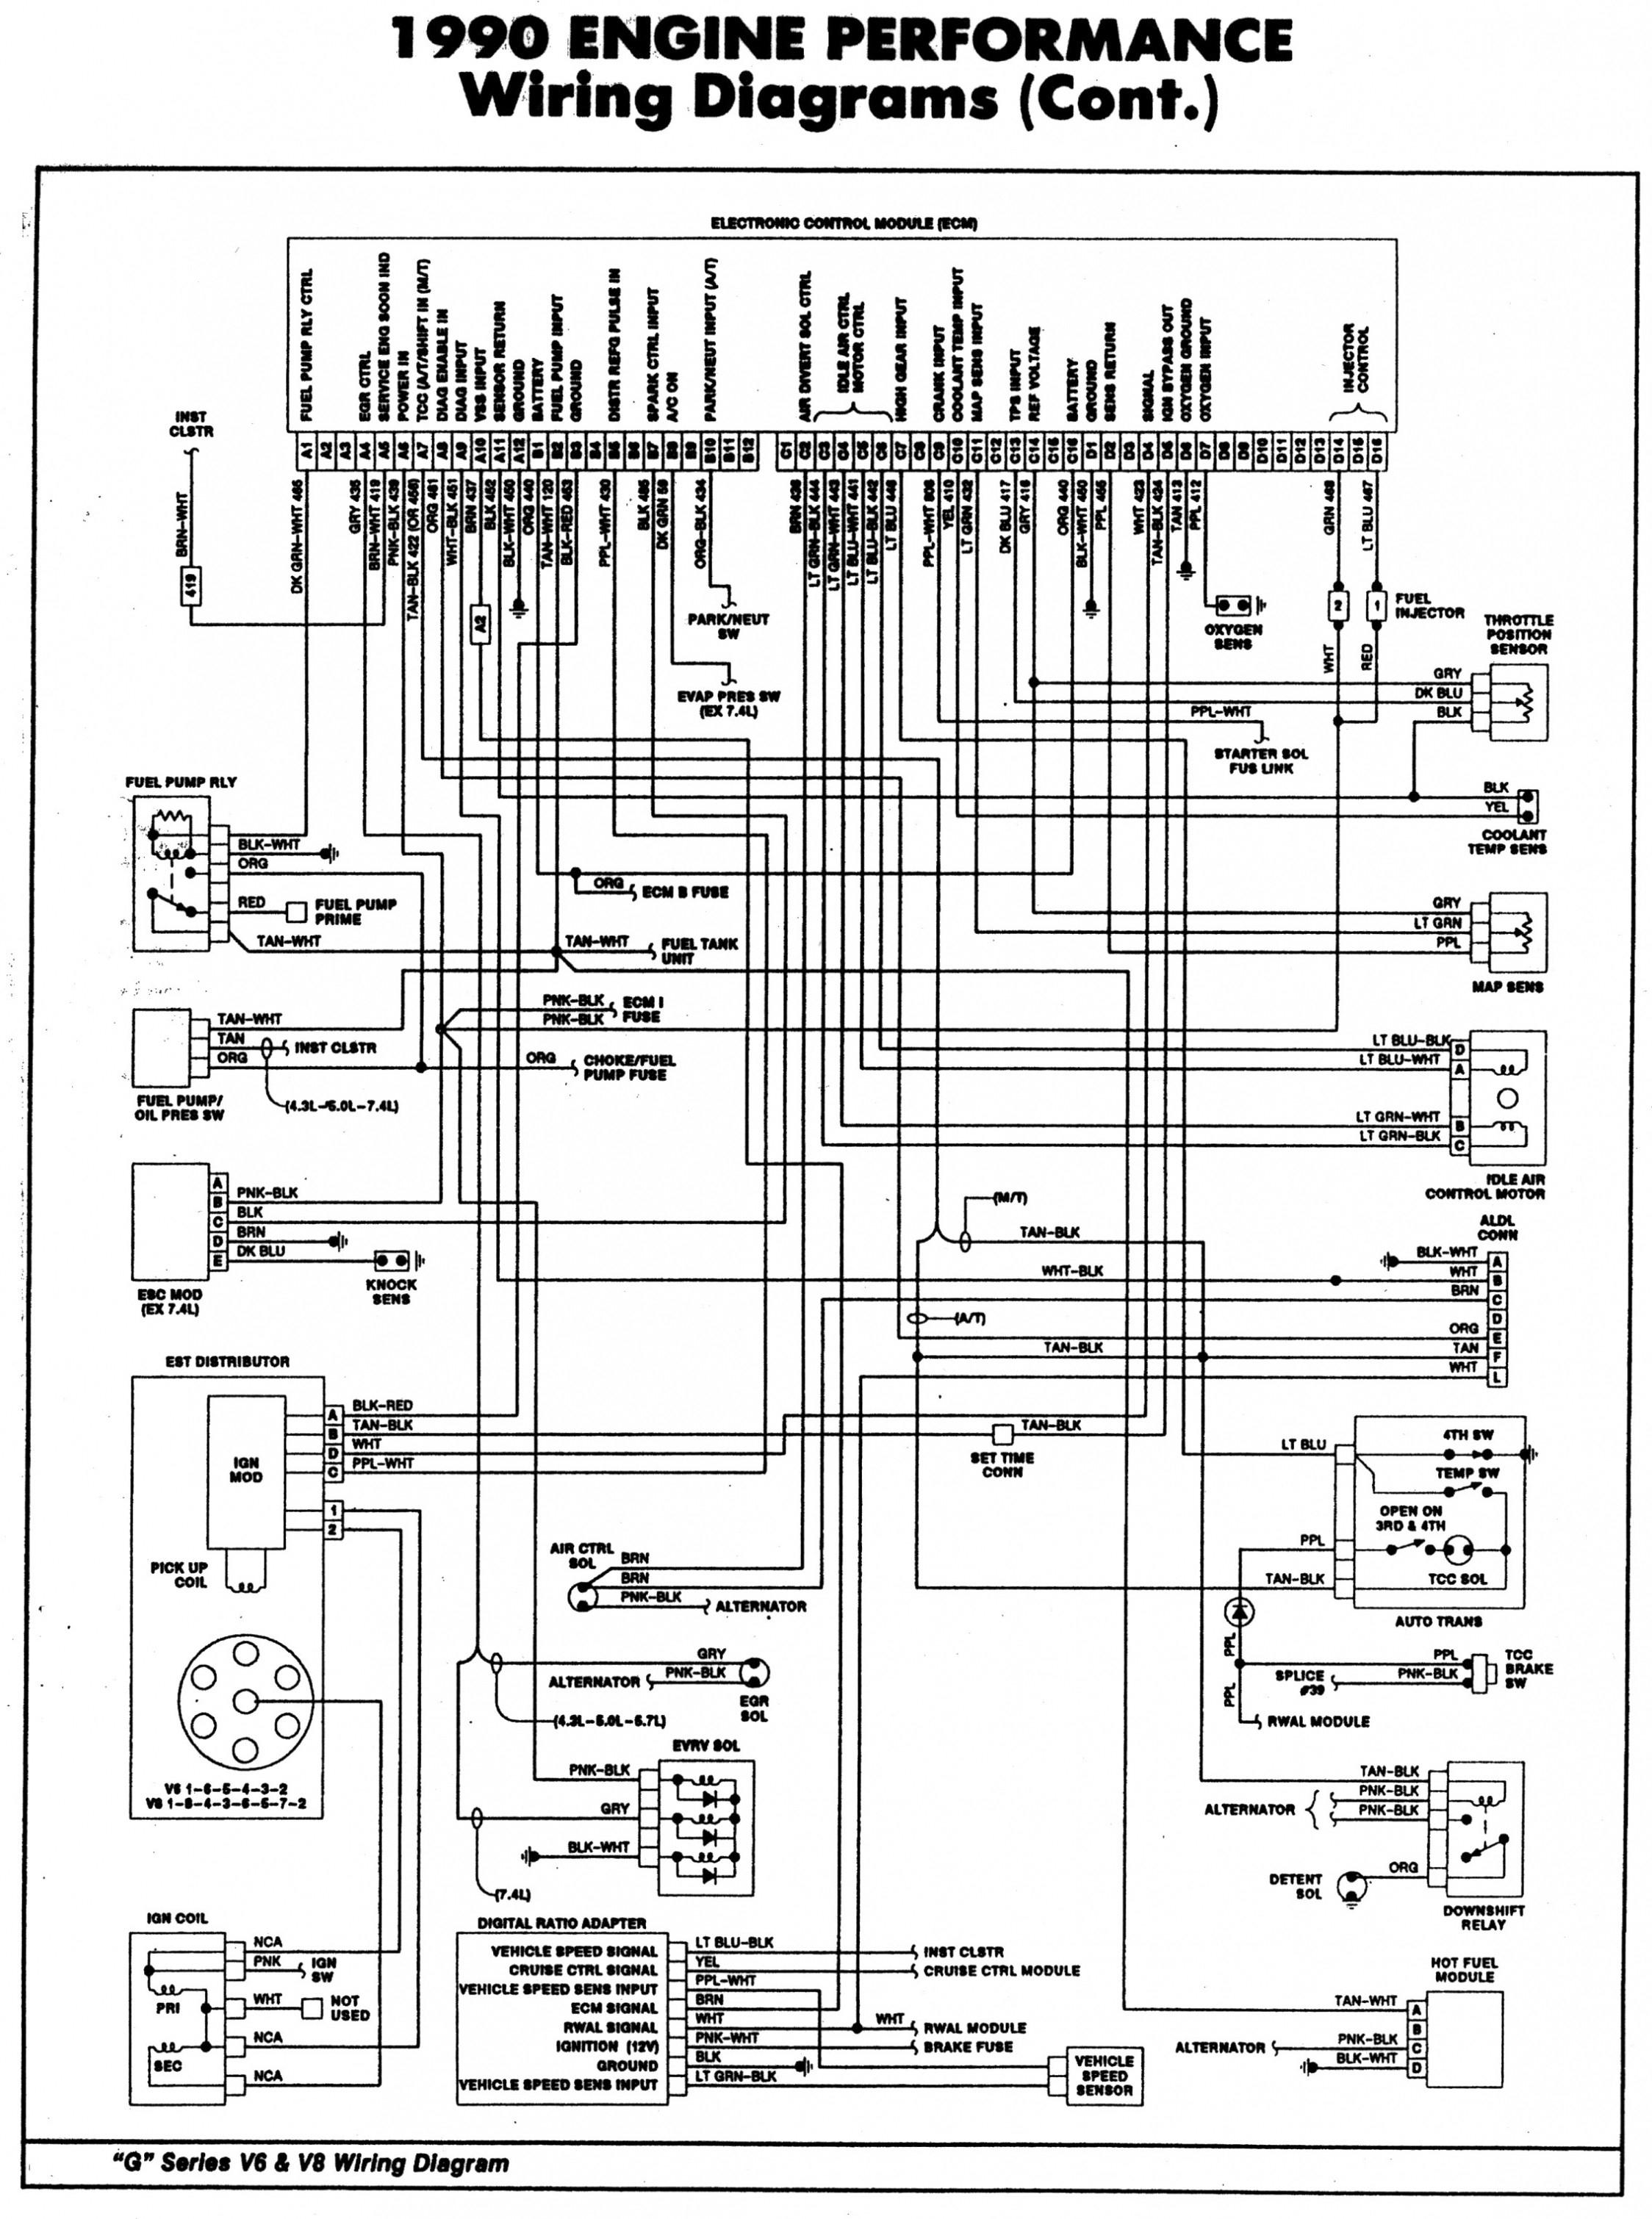 1994 Chevy Truck Brake Light Wiring Diagram Best Of Chevy Wiring - 1994 Chevy Truck Brake Light Wiring Diagram